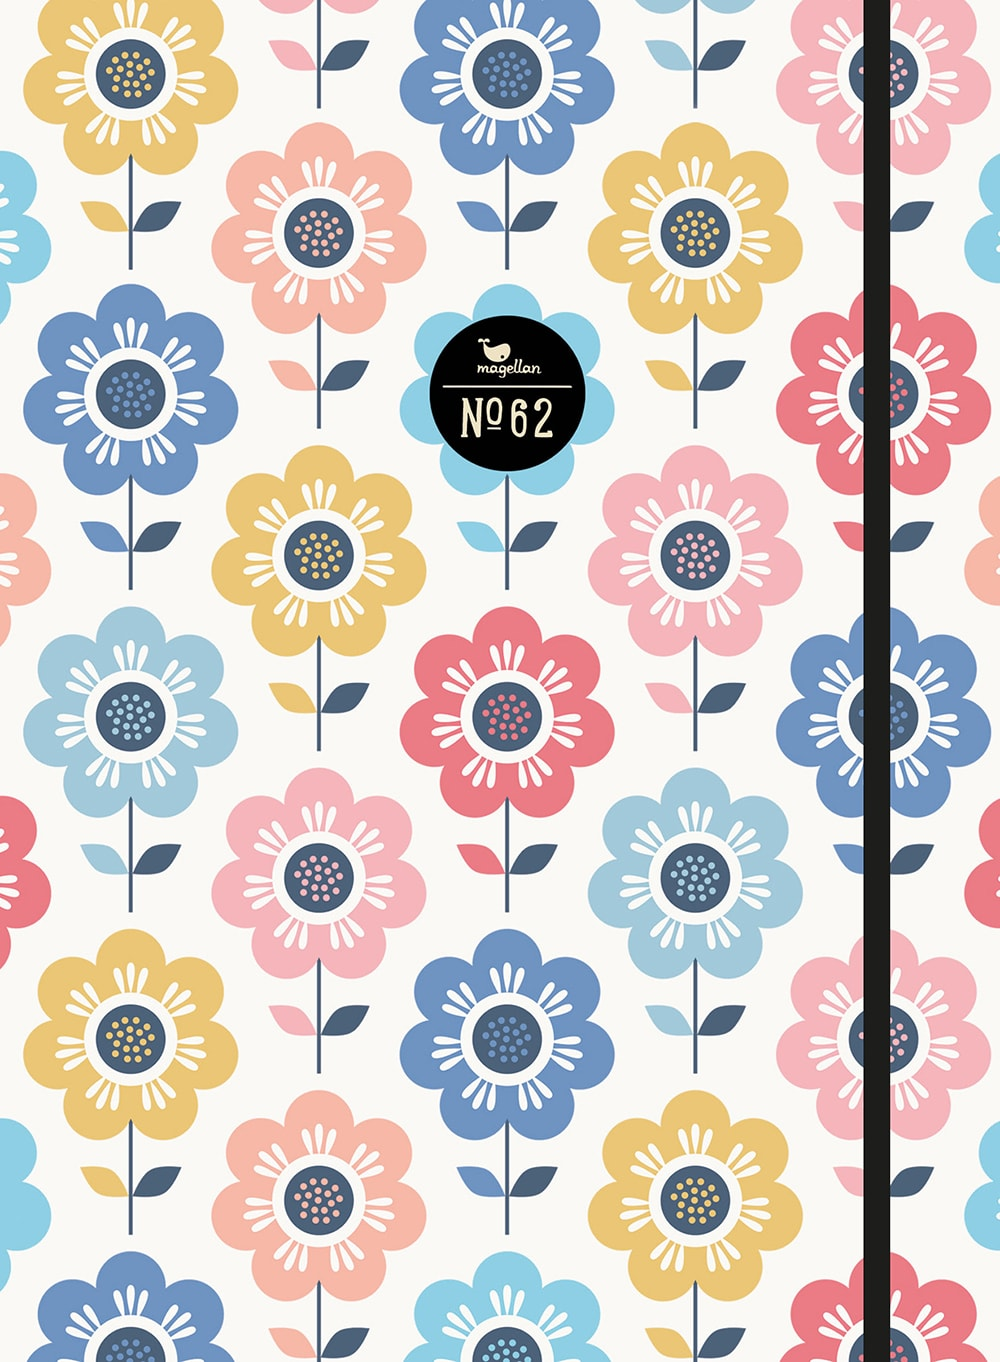 Notizbuch No. 62 - Flower-Power